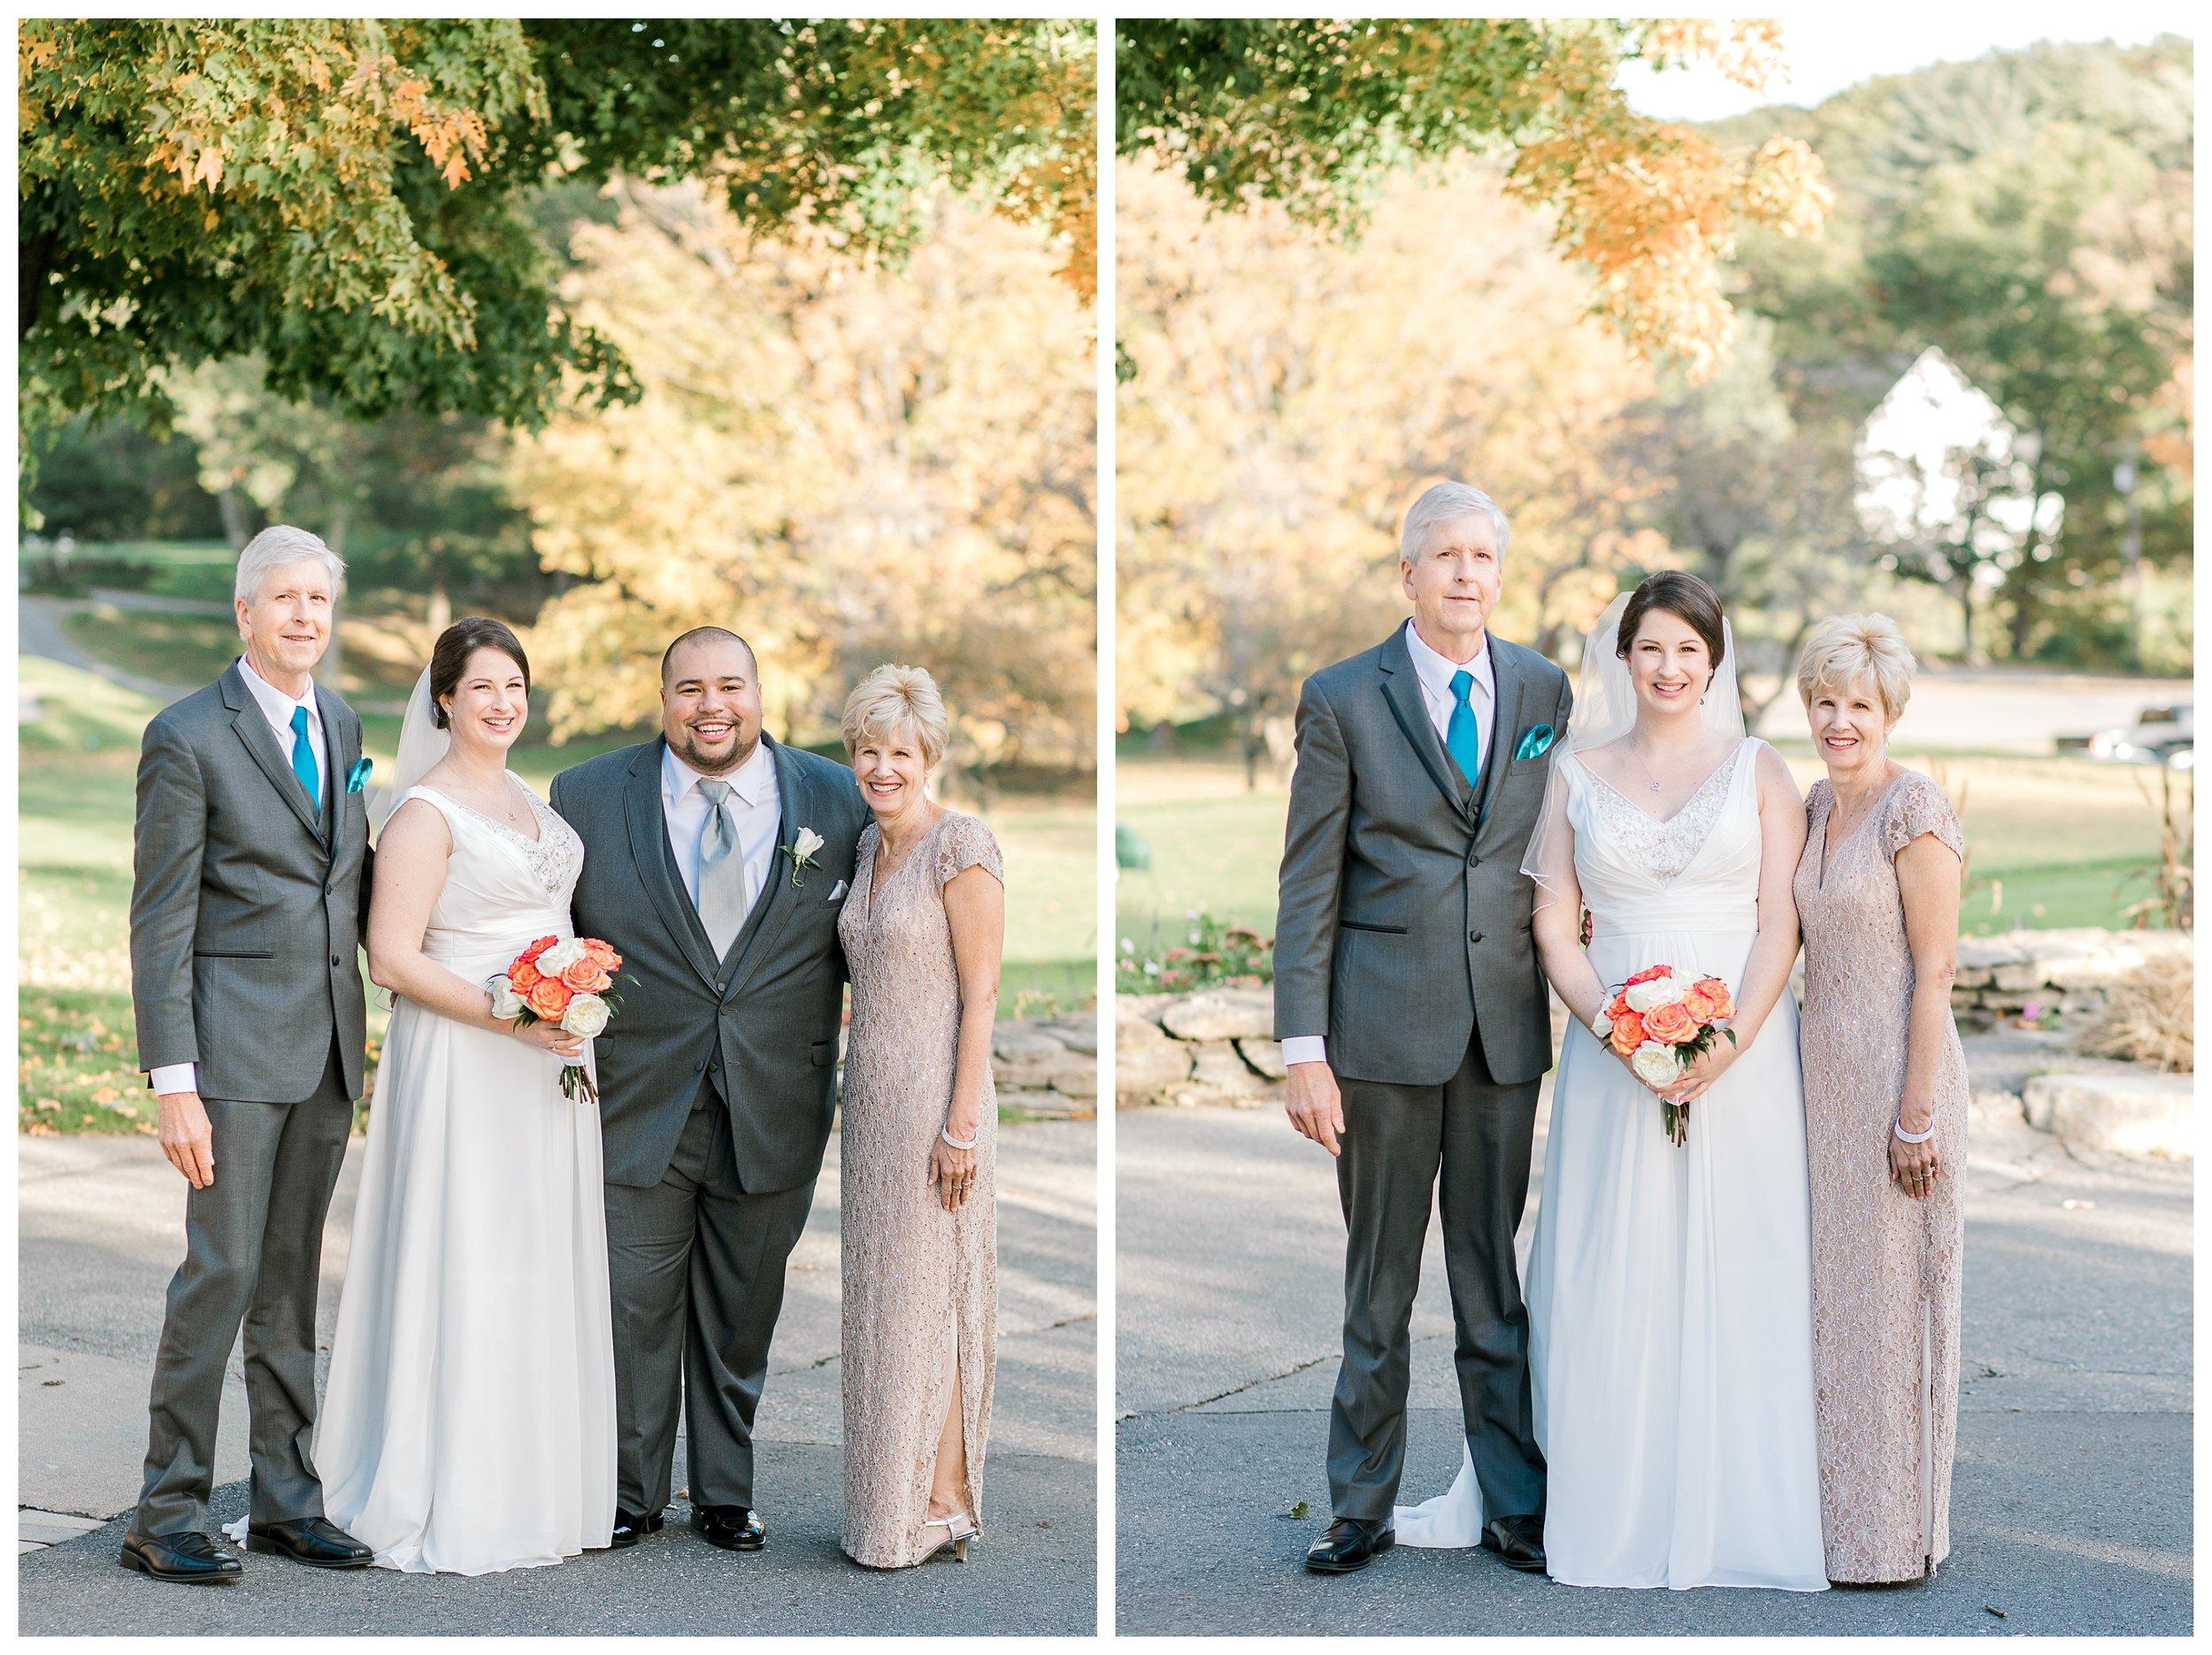 pleasant_valley_country_club_wedding_sutton_erica_pezente_photography (39).jpg